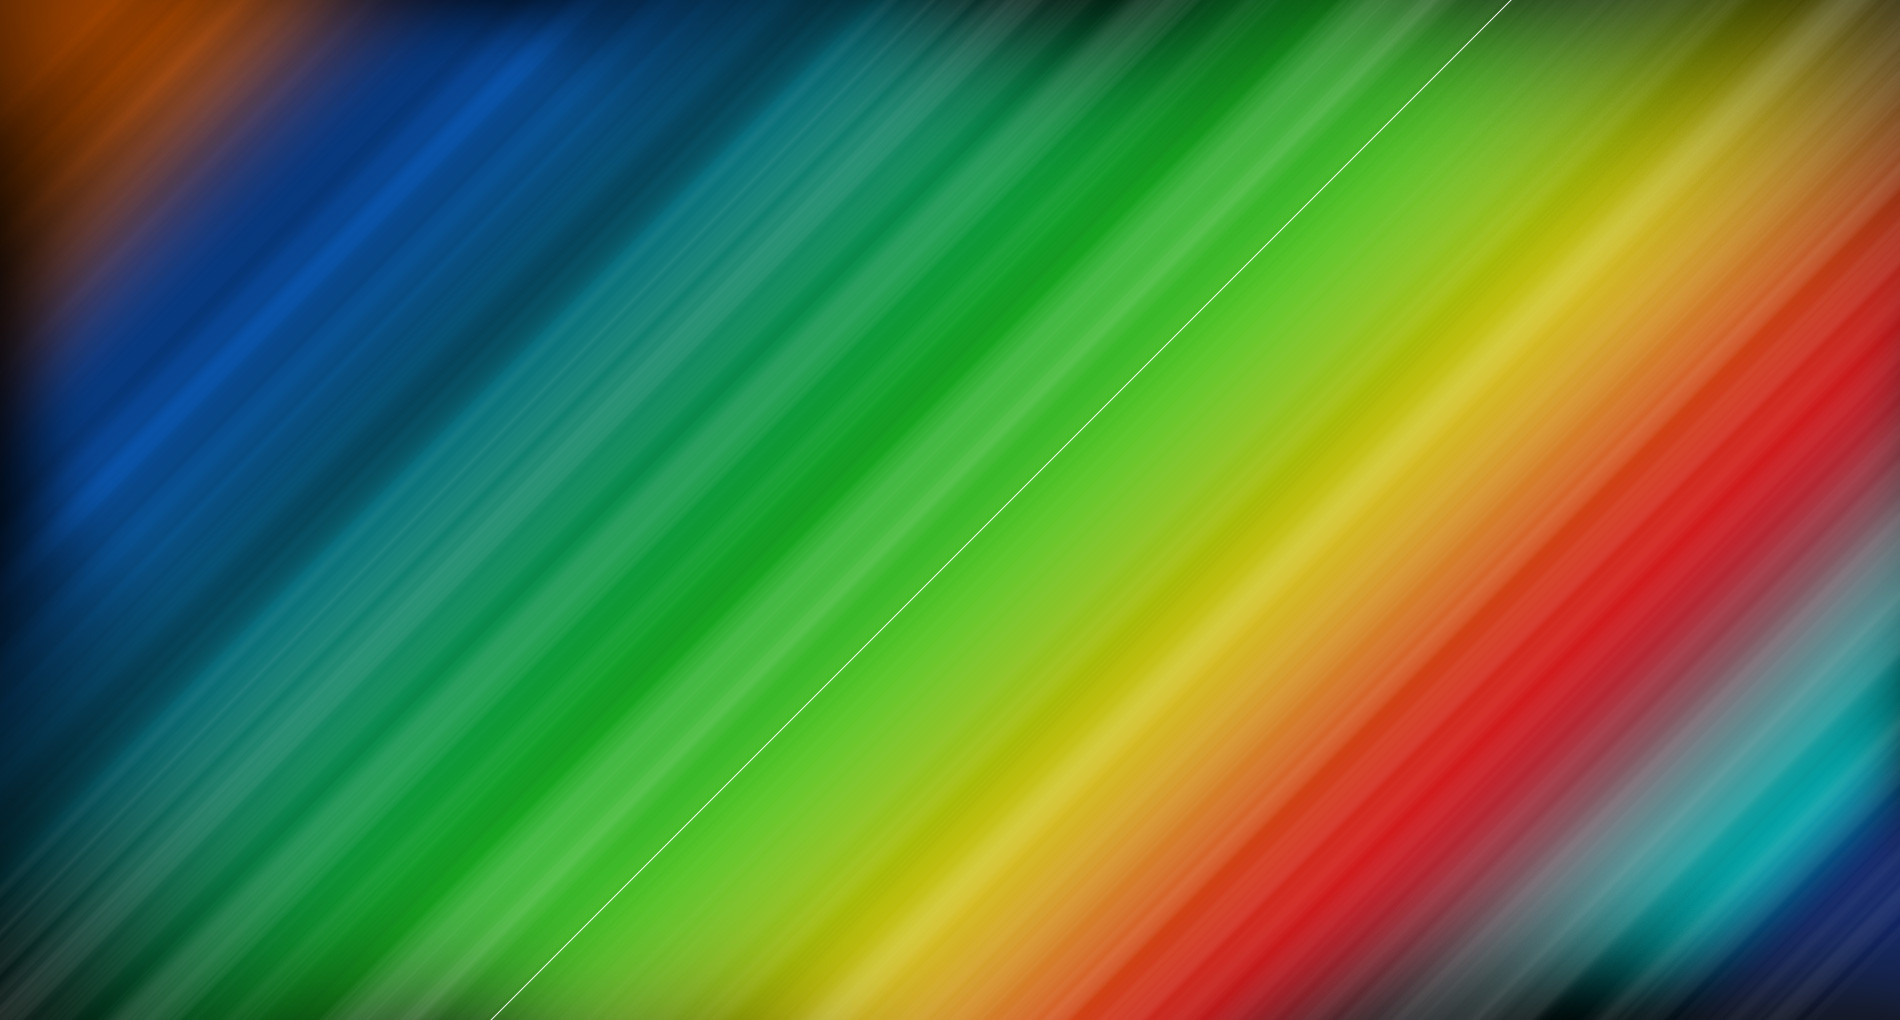 Plaid Desktop Wallpaper